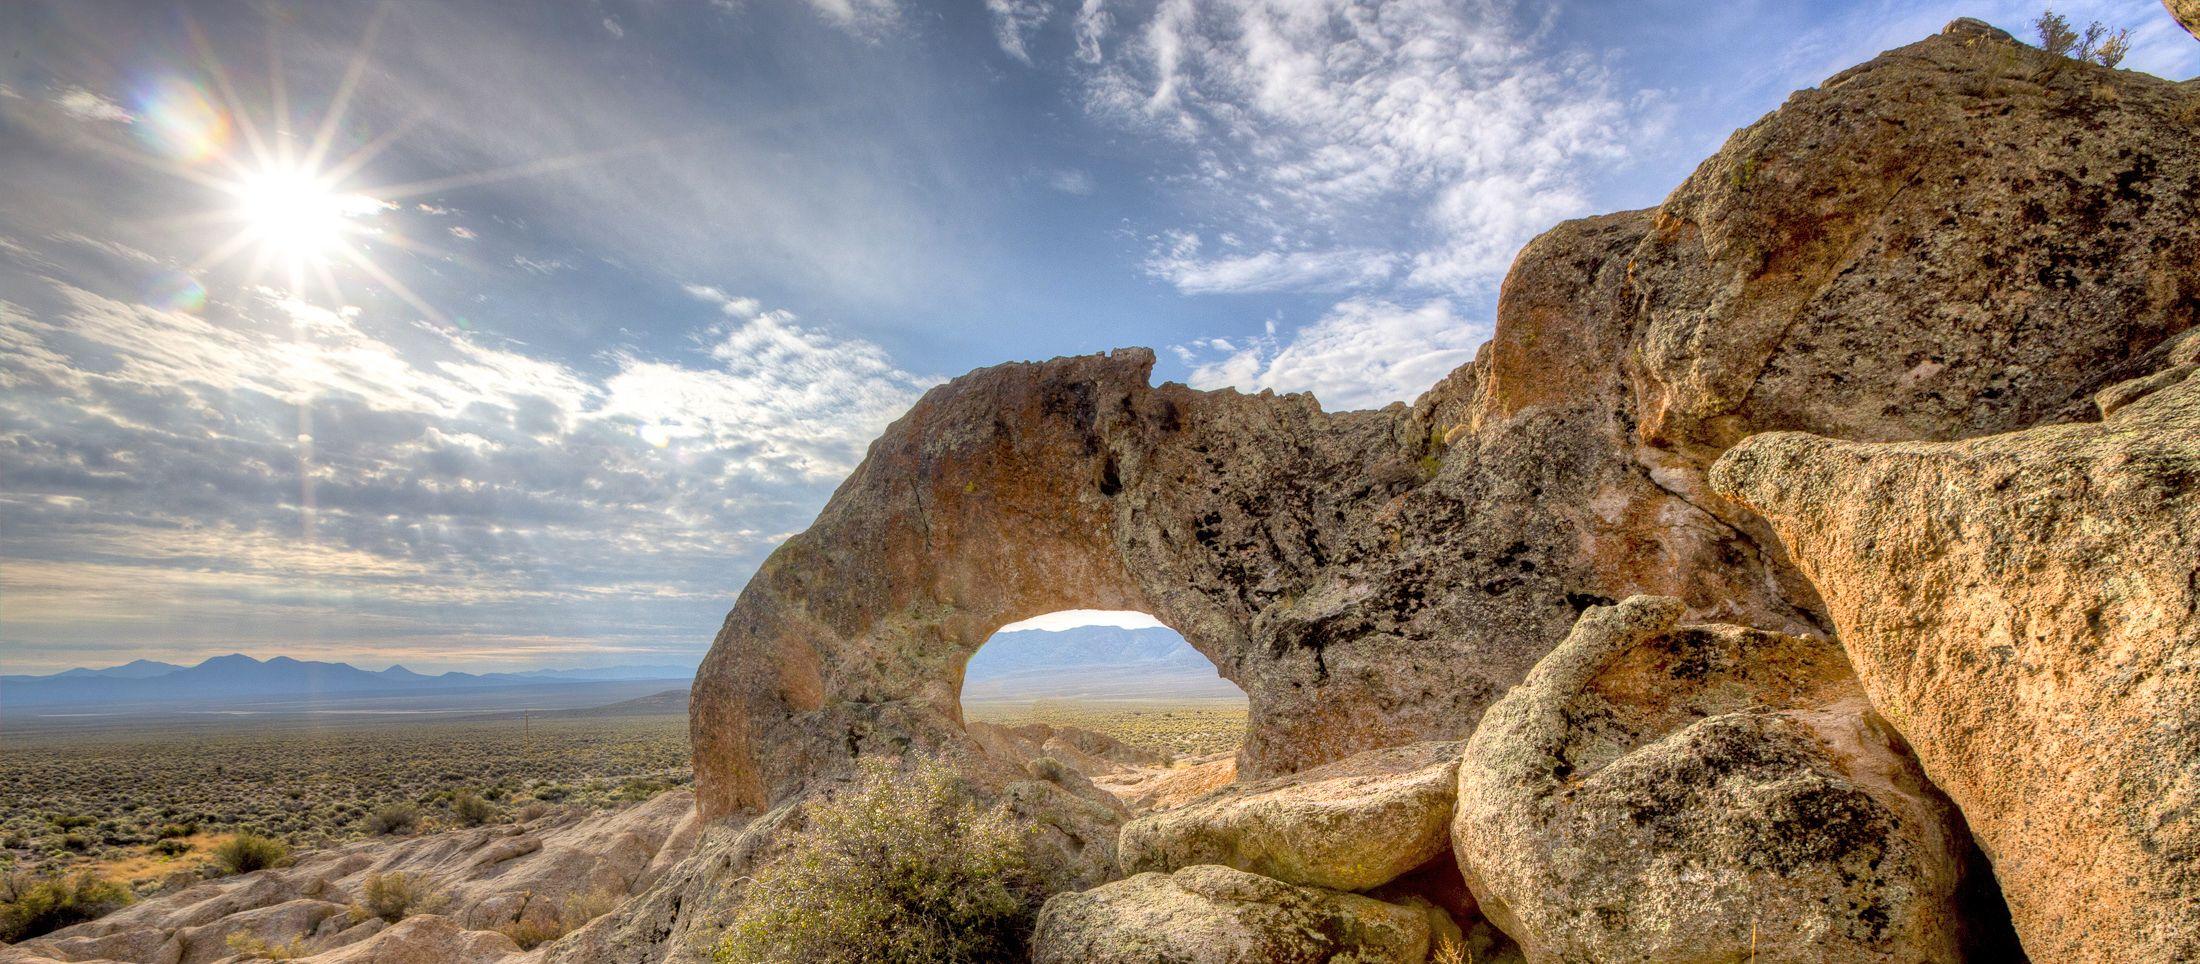 Felsformation im Basin and Range National Monument, Nevada